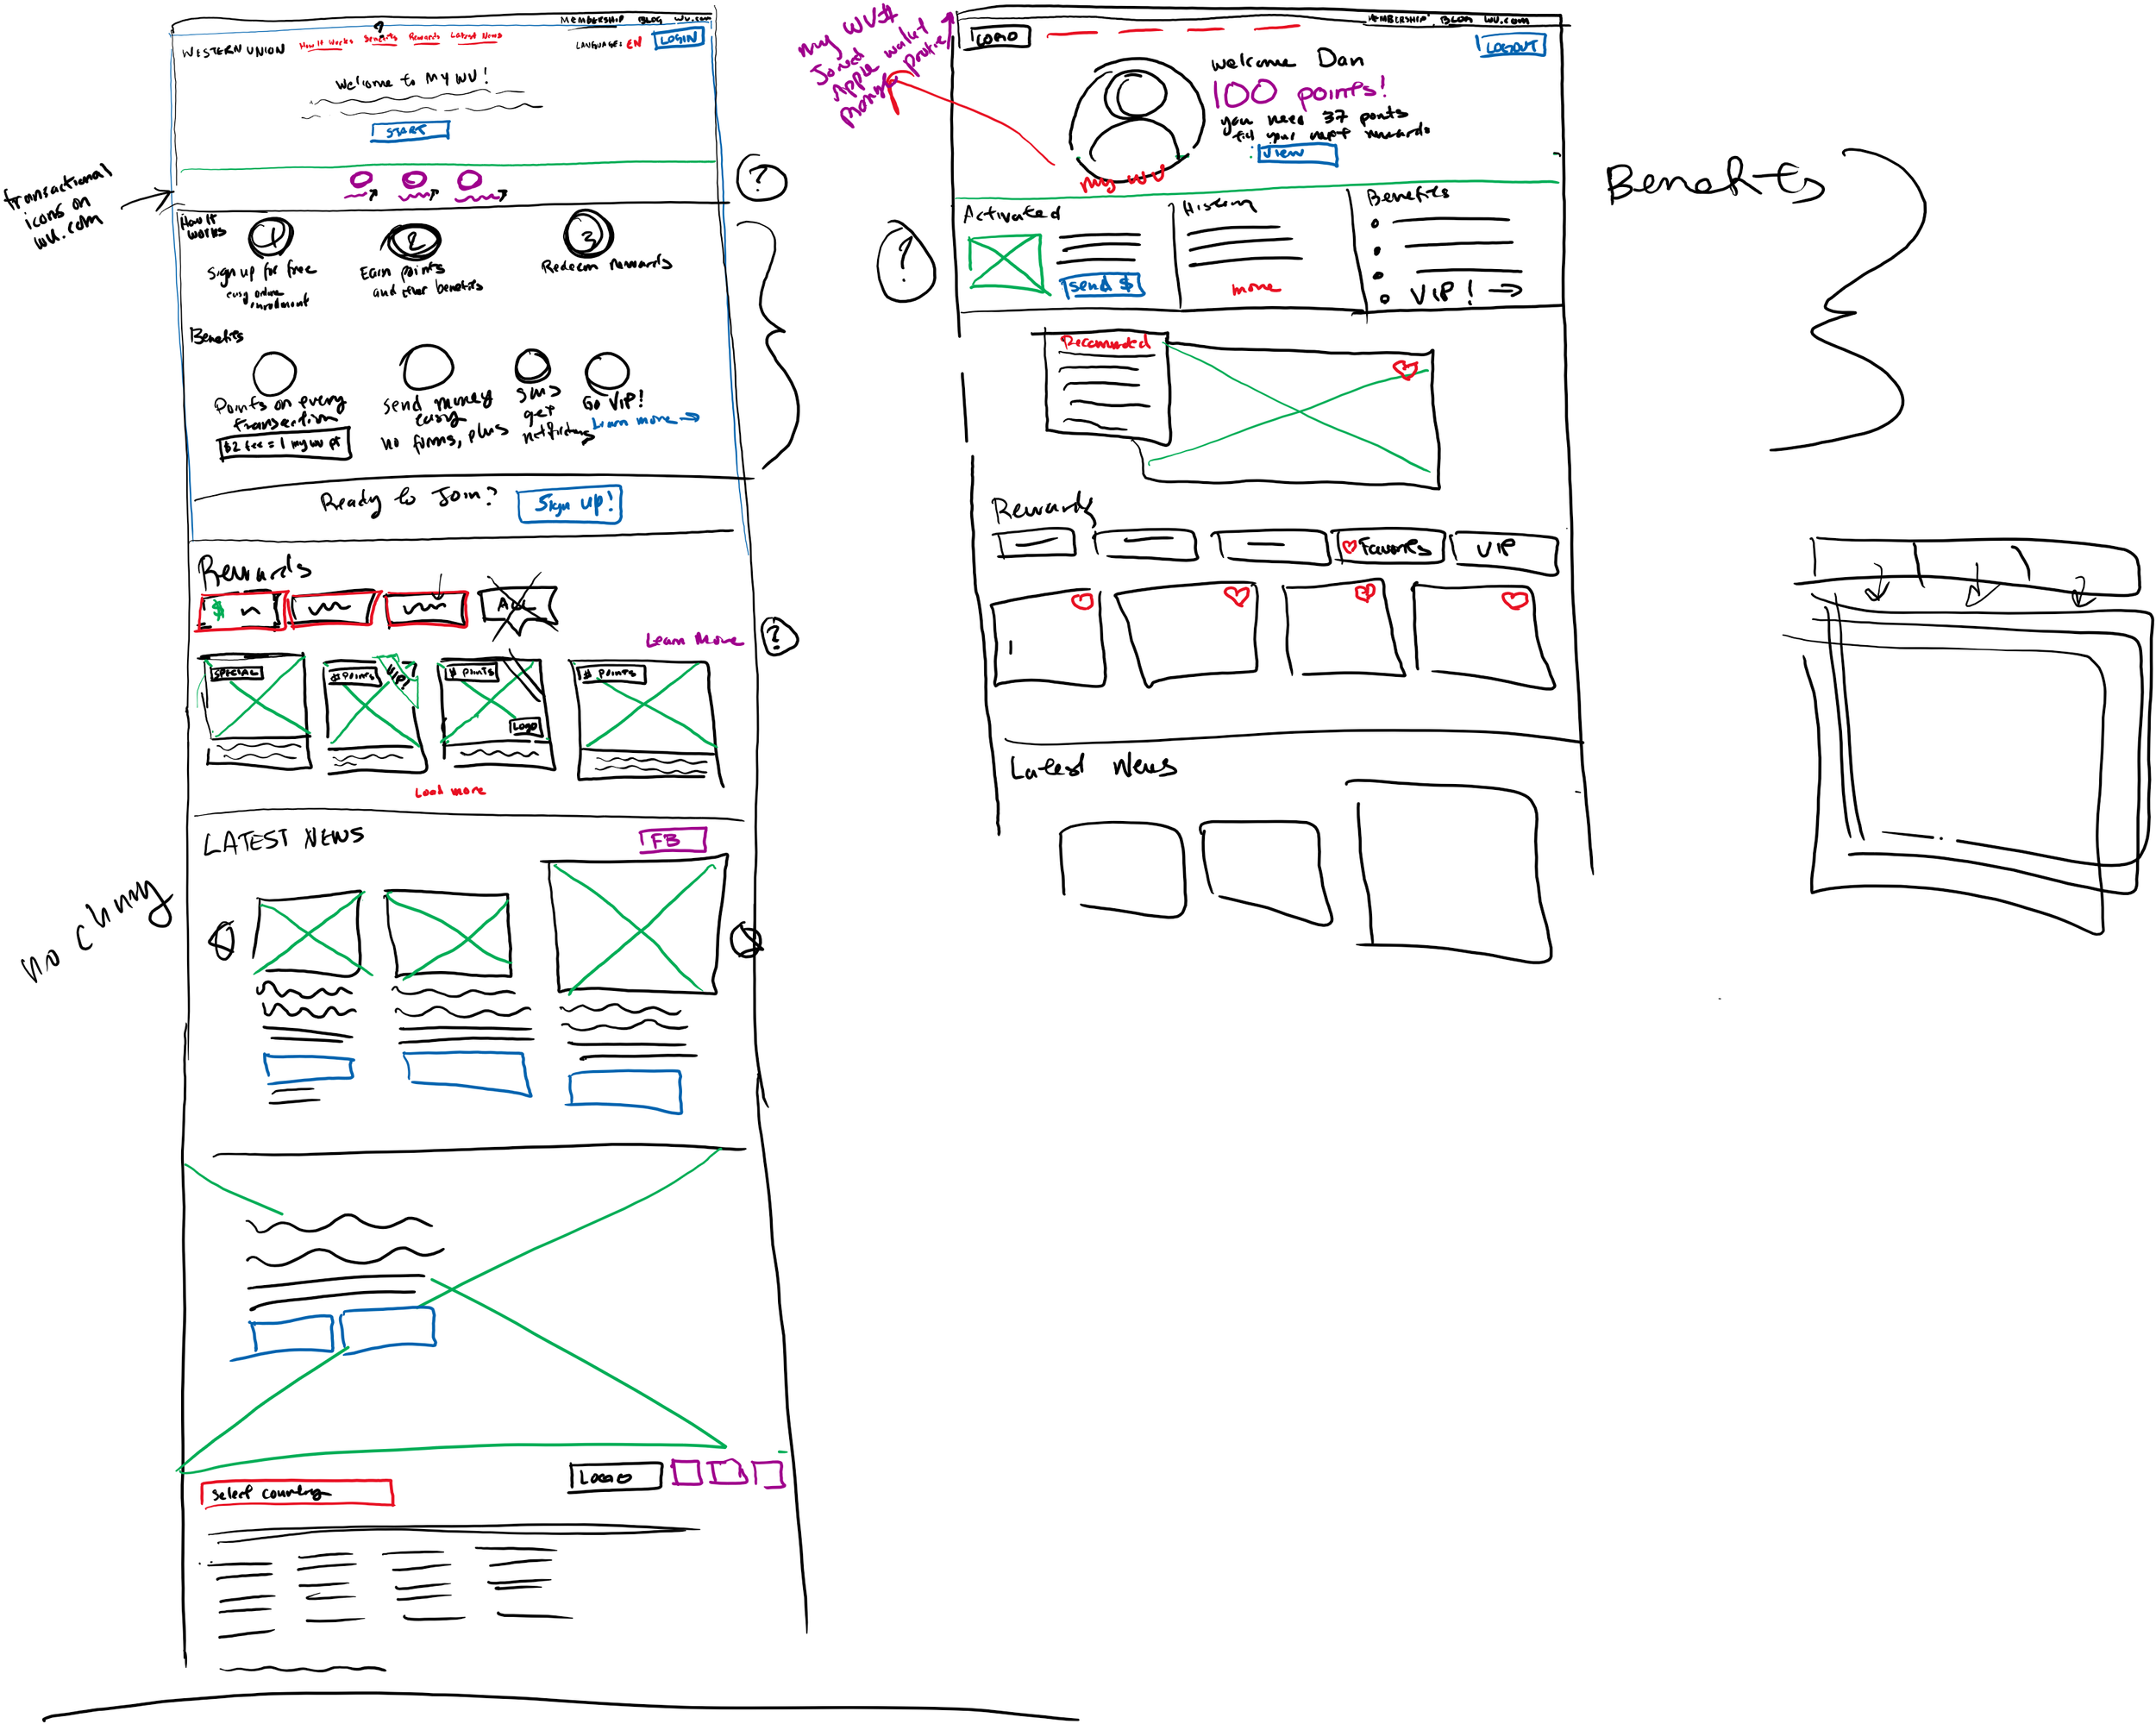 Whiteboard_mywu redesign_microsoft sketch.png